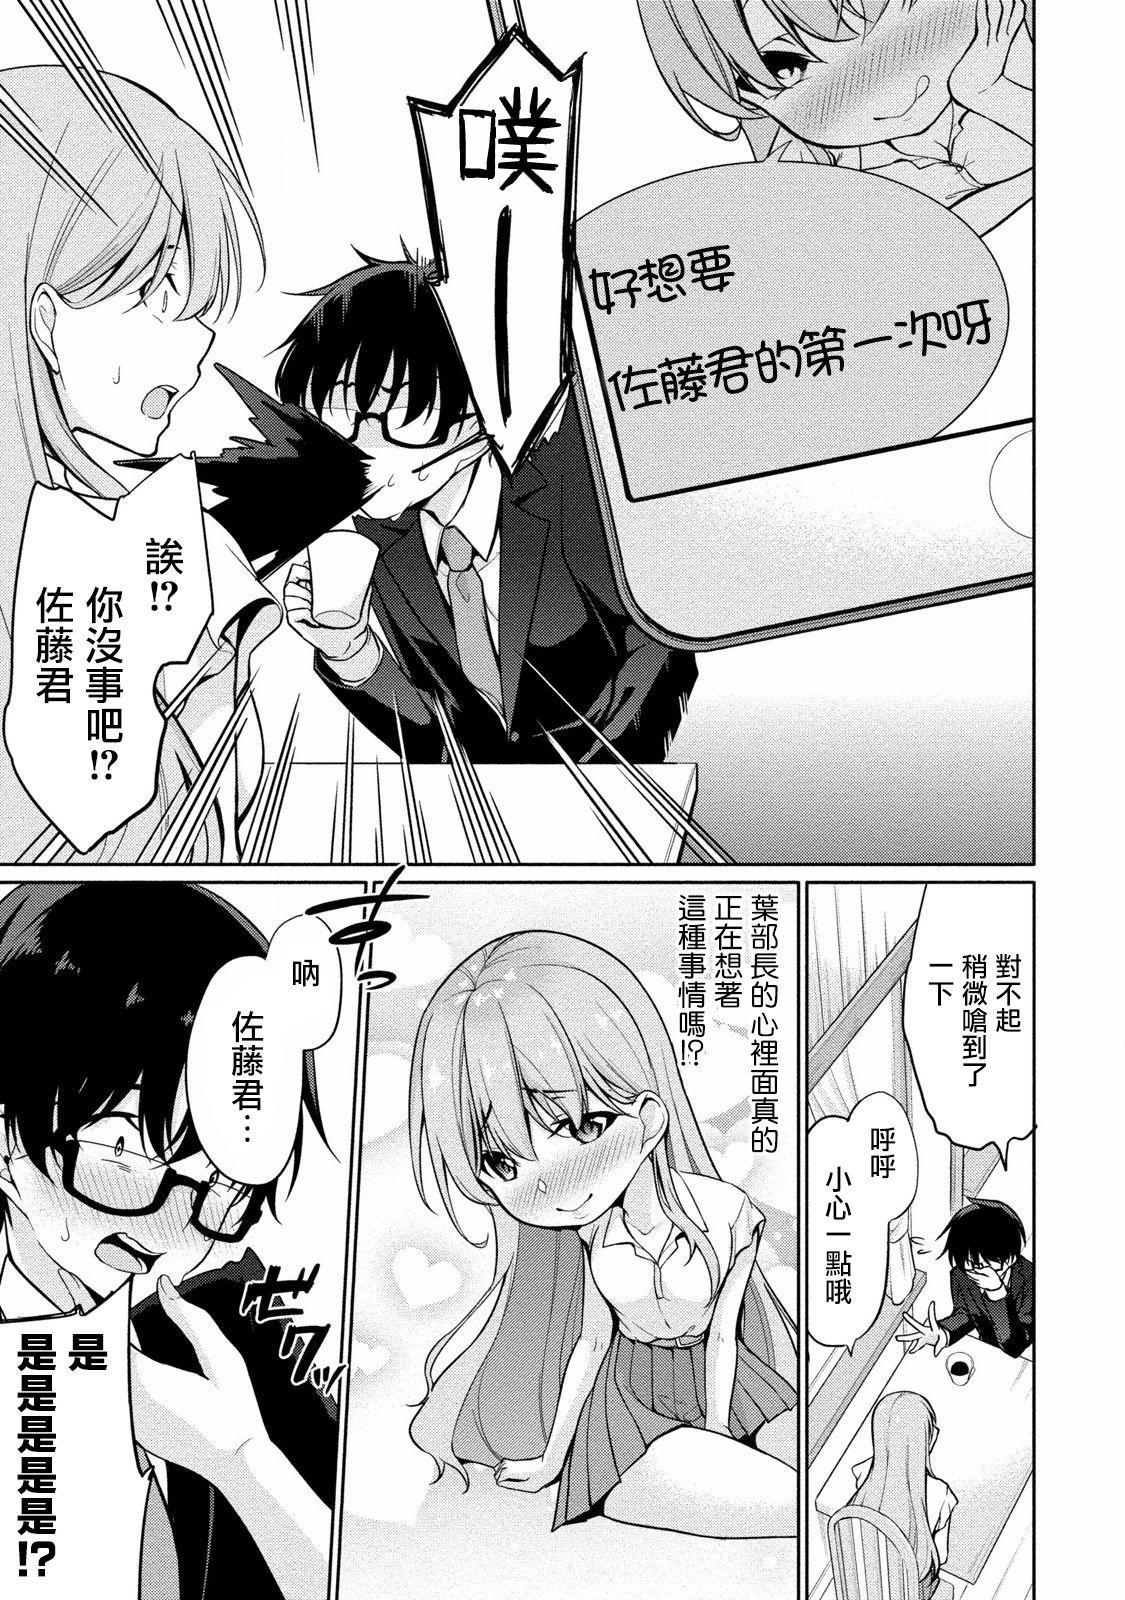 [Yukino] Satou-kun wa Miteiru. ~Kami-sama Appli de Onnanoko no Kokoro o Nozoitara Do XX datta~ Ch. 2 | 佐藤君正在偷窥。~用神大人的APP偷窥女孩子的内心却发现原来是抖XX~02话 [Chinese] [前线作♂战♀基地] 14